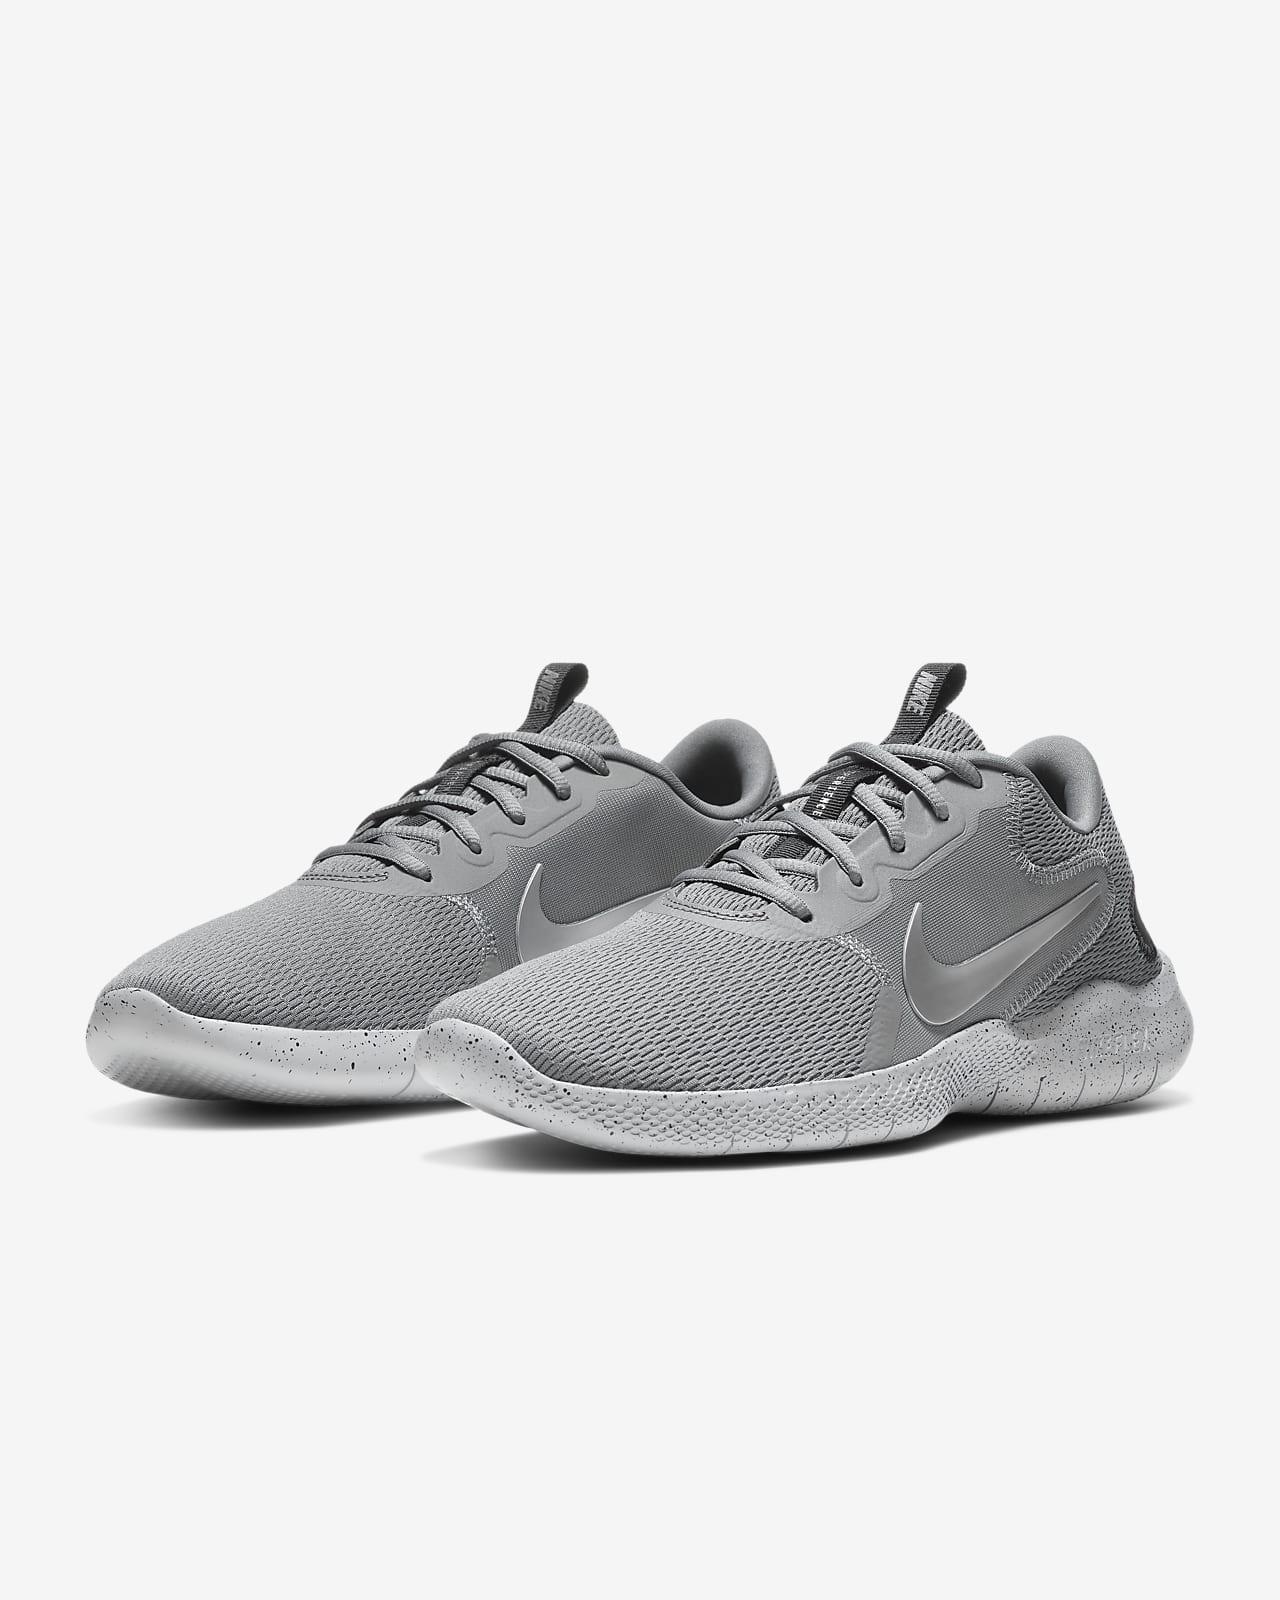 Nike Flex Experience Run 9 Premium Men's Running Shoe